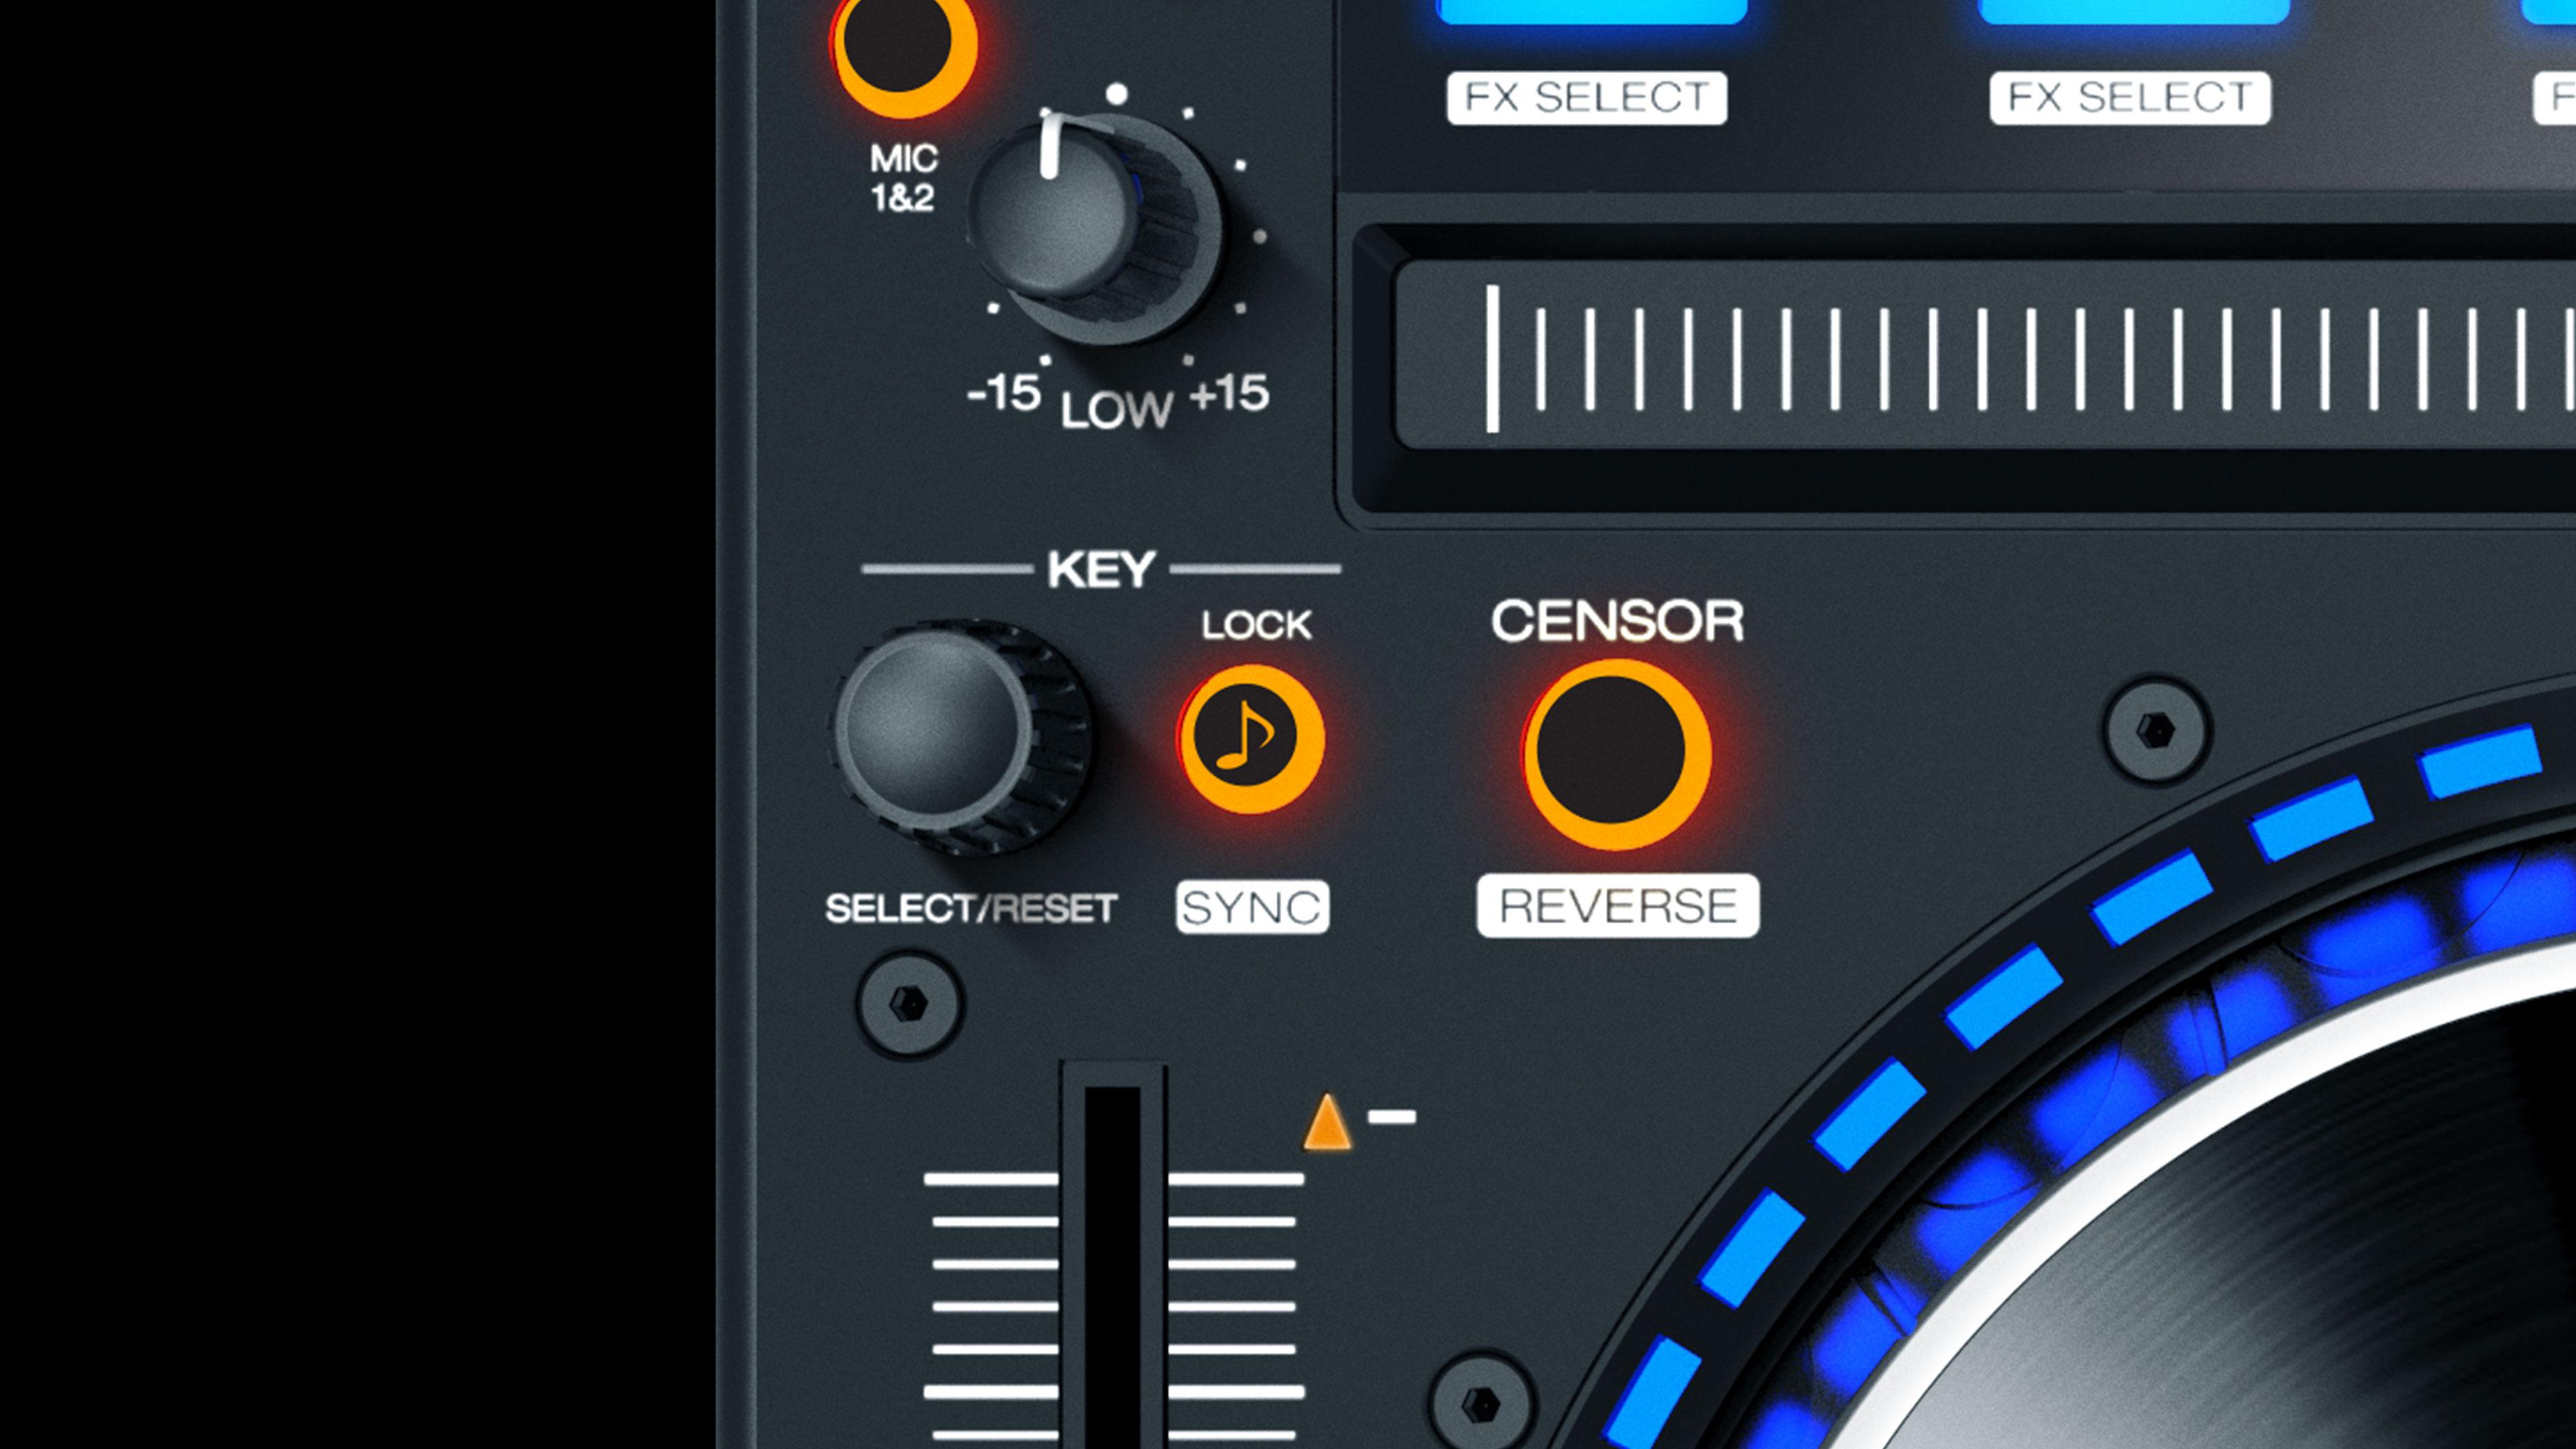 Denon DJ 已经满血复活,复出后的首秀 MC8000 已经赚足了眼球。在 DJ Expo 2016 上 Denon DJ 又带来了一款 MC7000 的 Serato 控制器 - 4 轨道的重型武器, 却比 DDJ-SZ 便宜了 $1000 美刀。  Denon MC7000 有着与 MC8000 类似的布局设计:2 X 6 寸转轮,16 X 彩色打击垫,直观的调性控制等等,不过精简了彩色屏幕和 U 盘插口。  没错,你可以把 MC7000 看做是简化版的 MC8000, 少了独立运行的功能机制,但